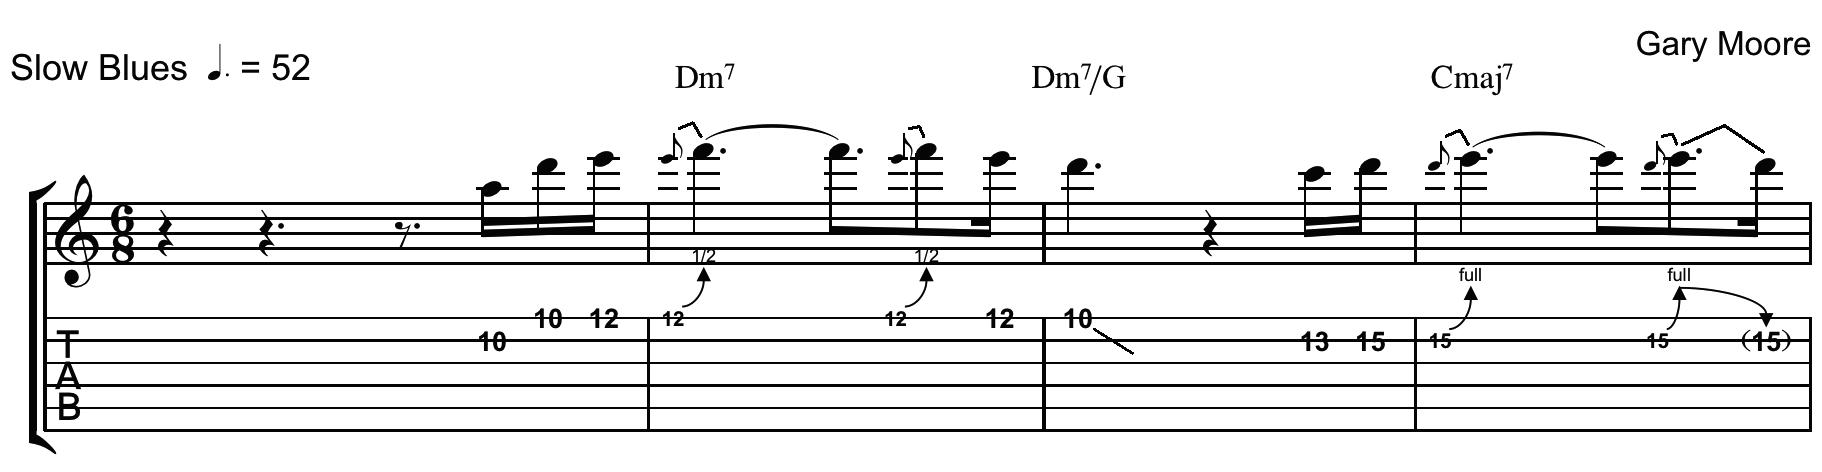 still-got-the-blues-guitar-tab_1.png